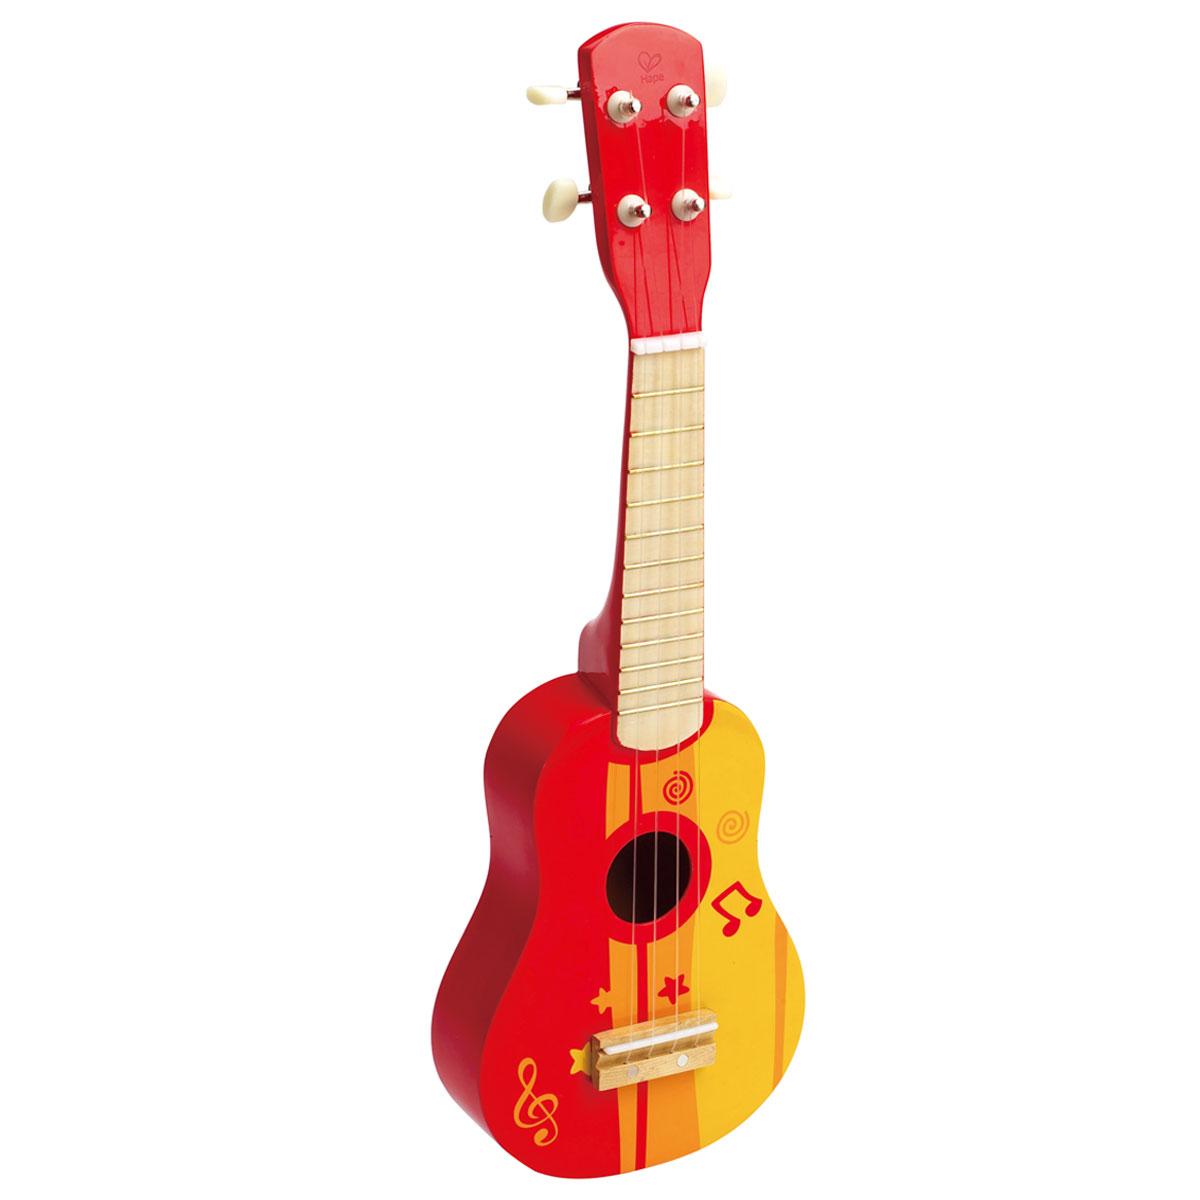 Holzspielzeug HAPE E0301 Rhythmus-Set